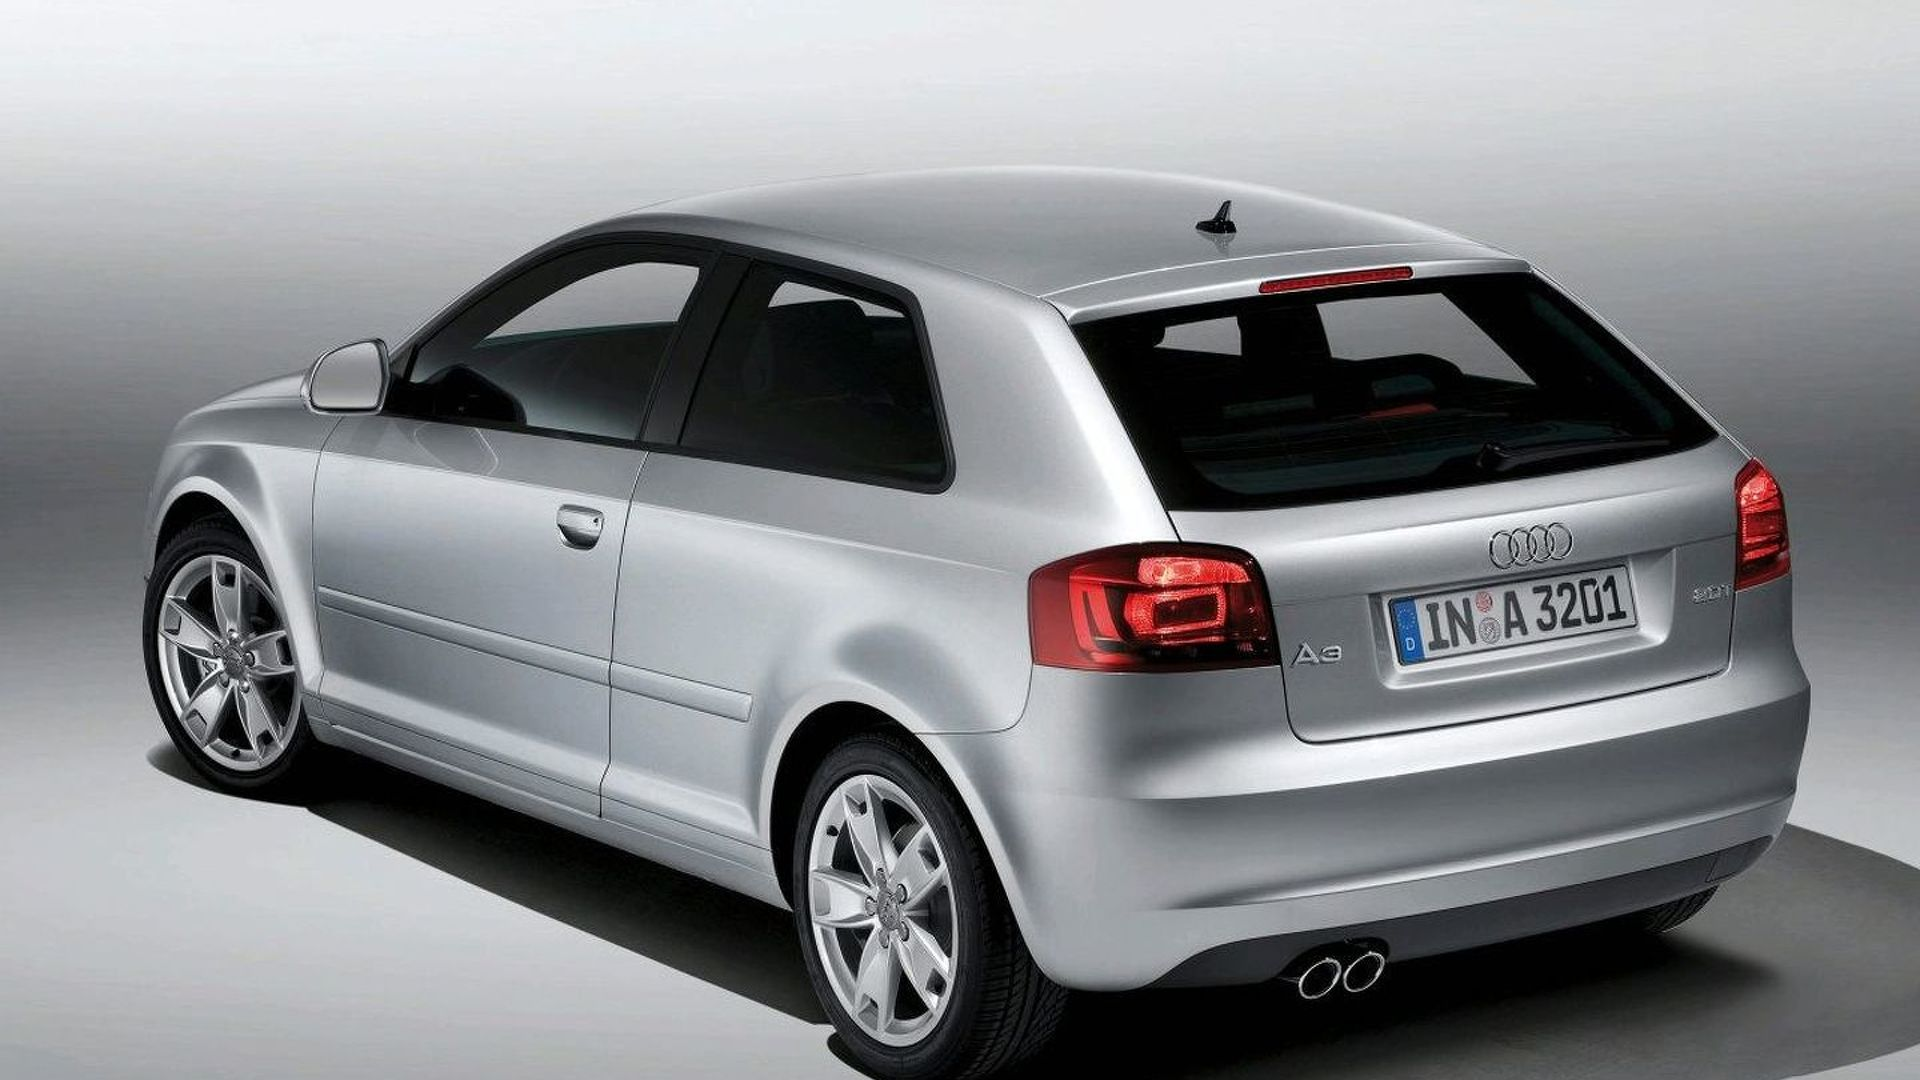 Kekurangan Audi A3 2009 Top Model Tahun Ini